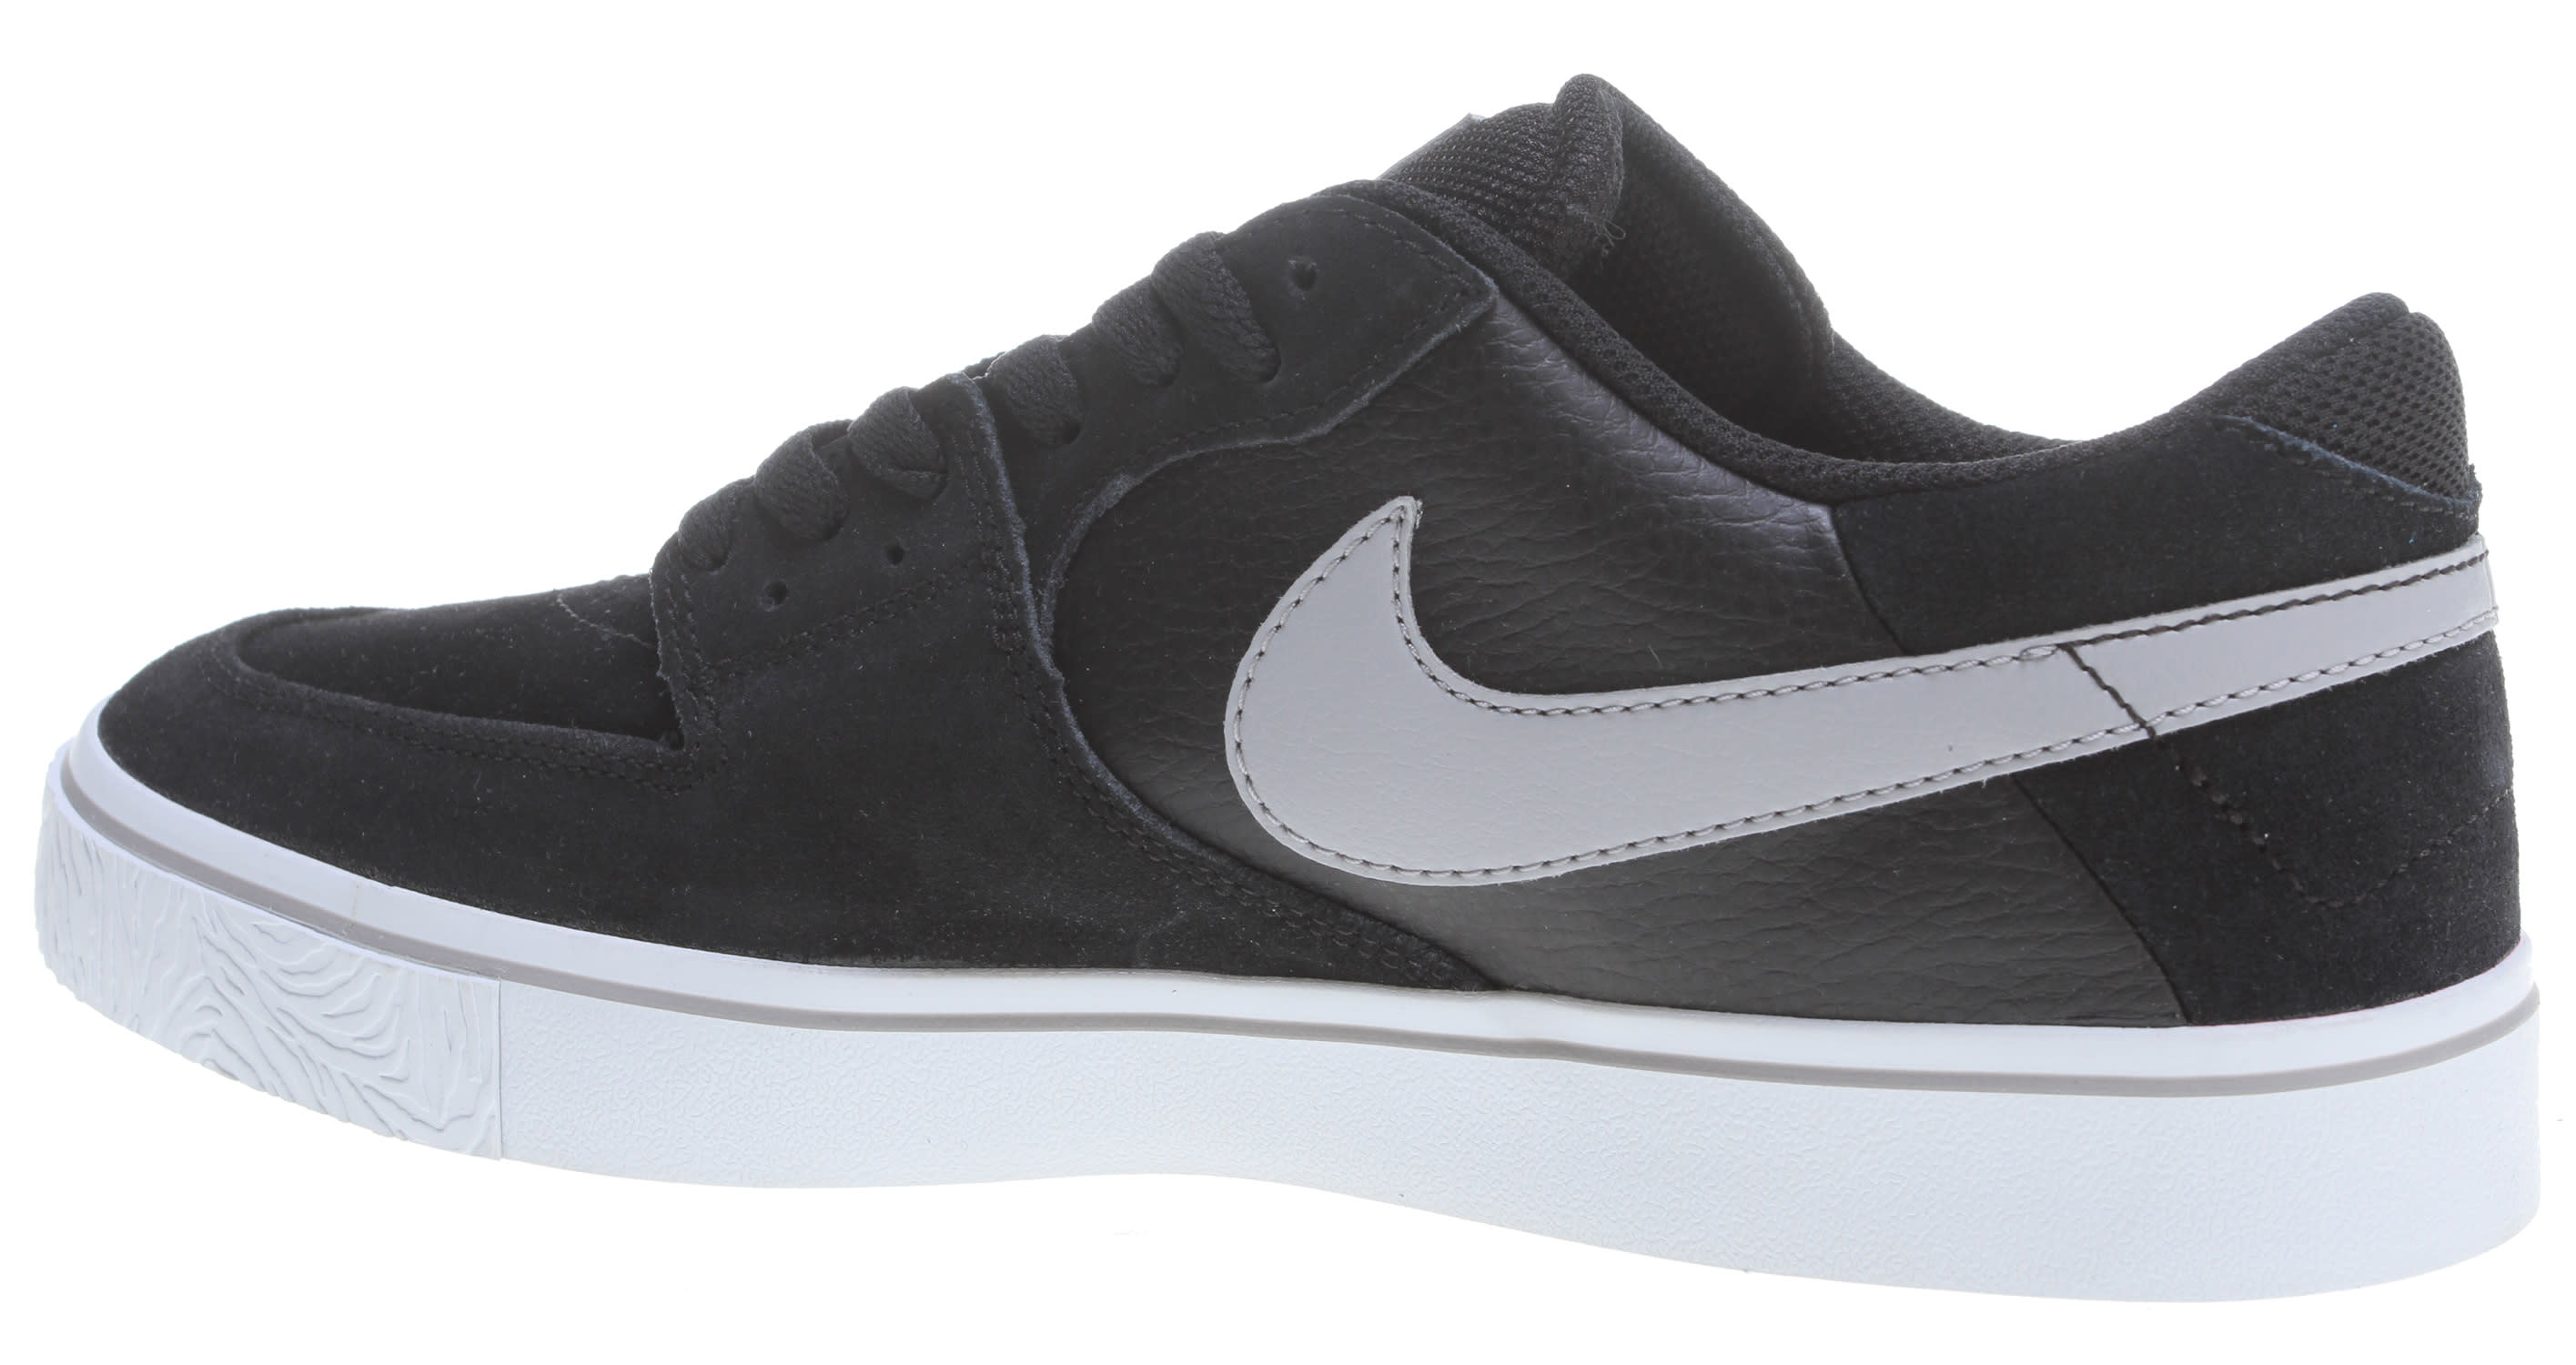 Nike Paul Rodriguez 7 Vr Skate Shoes